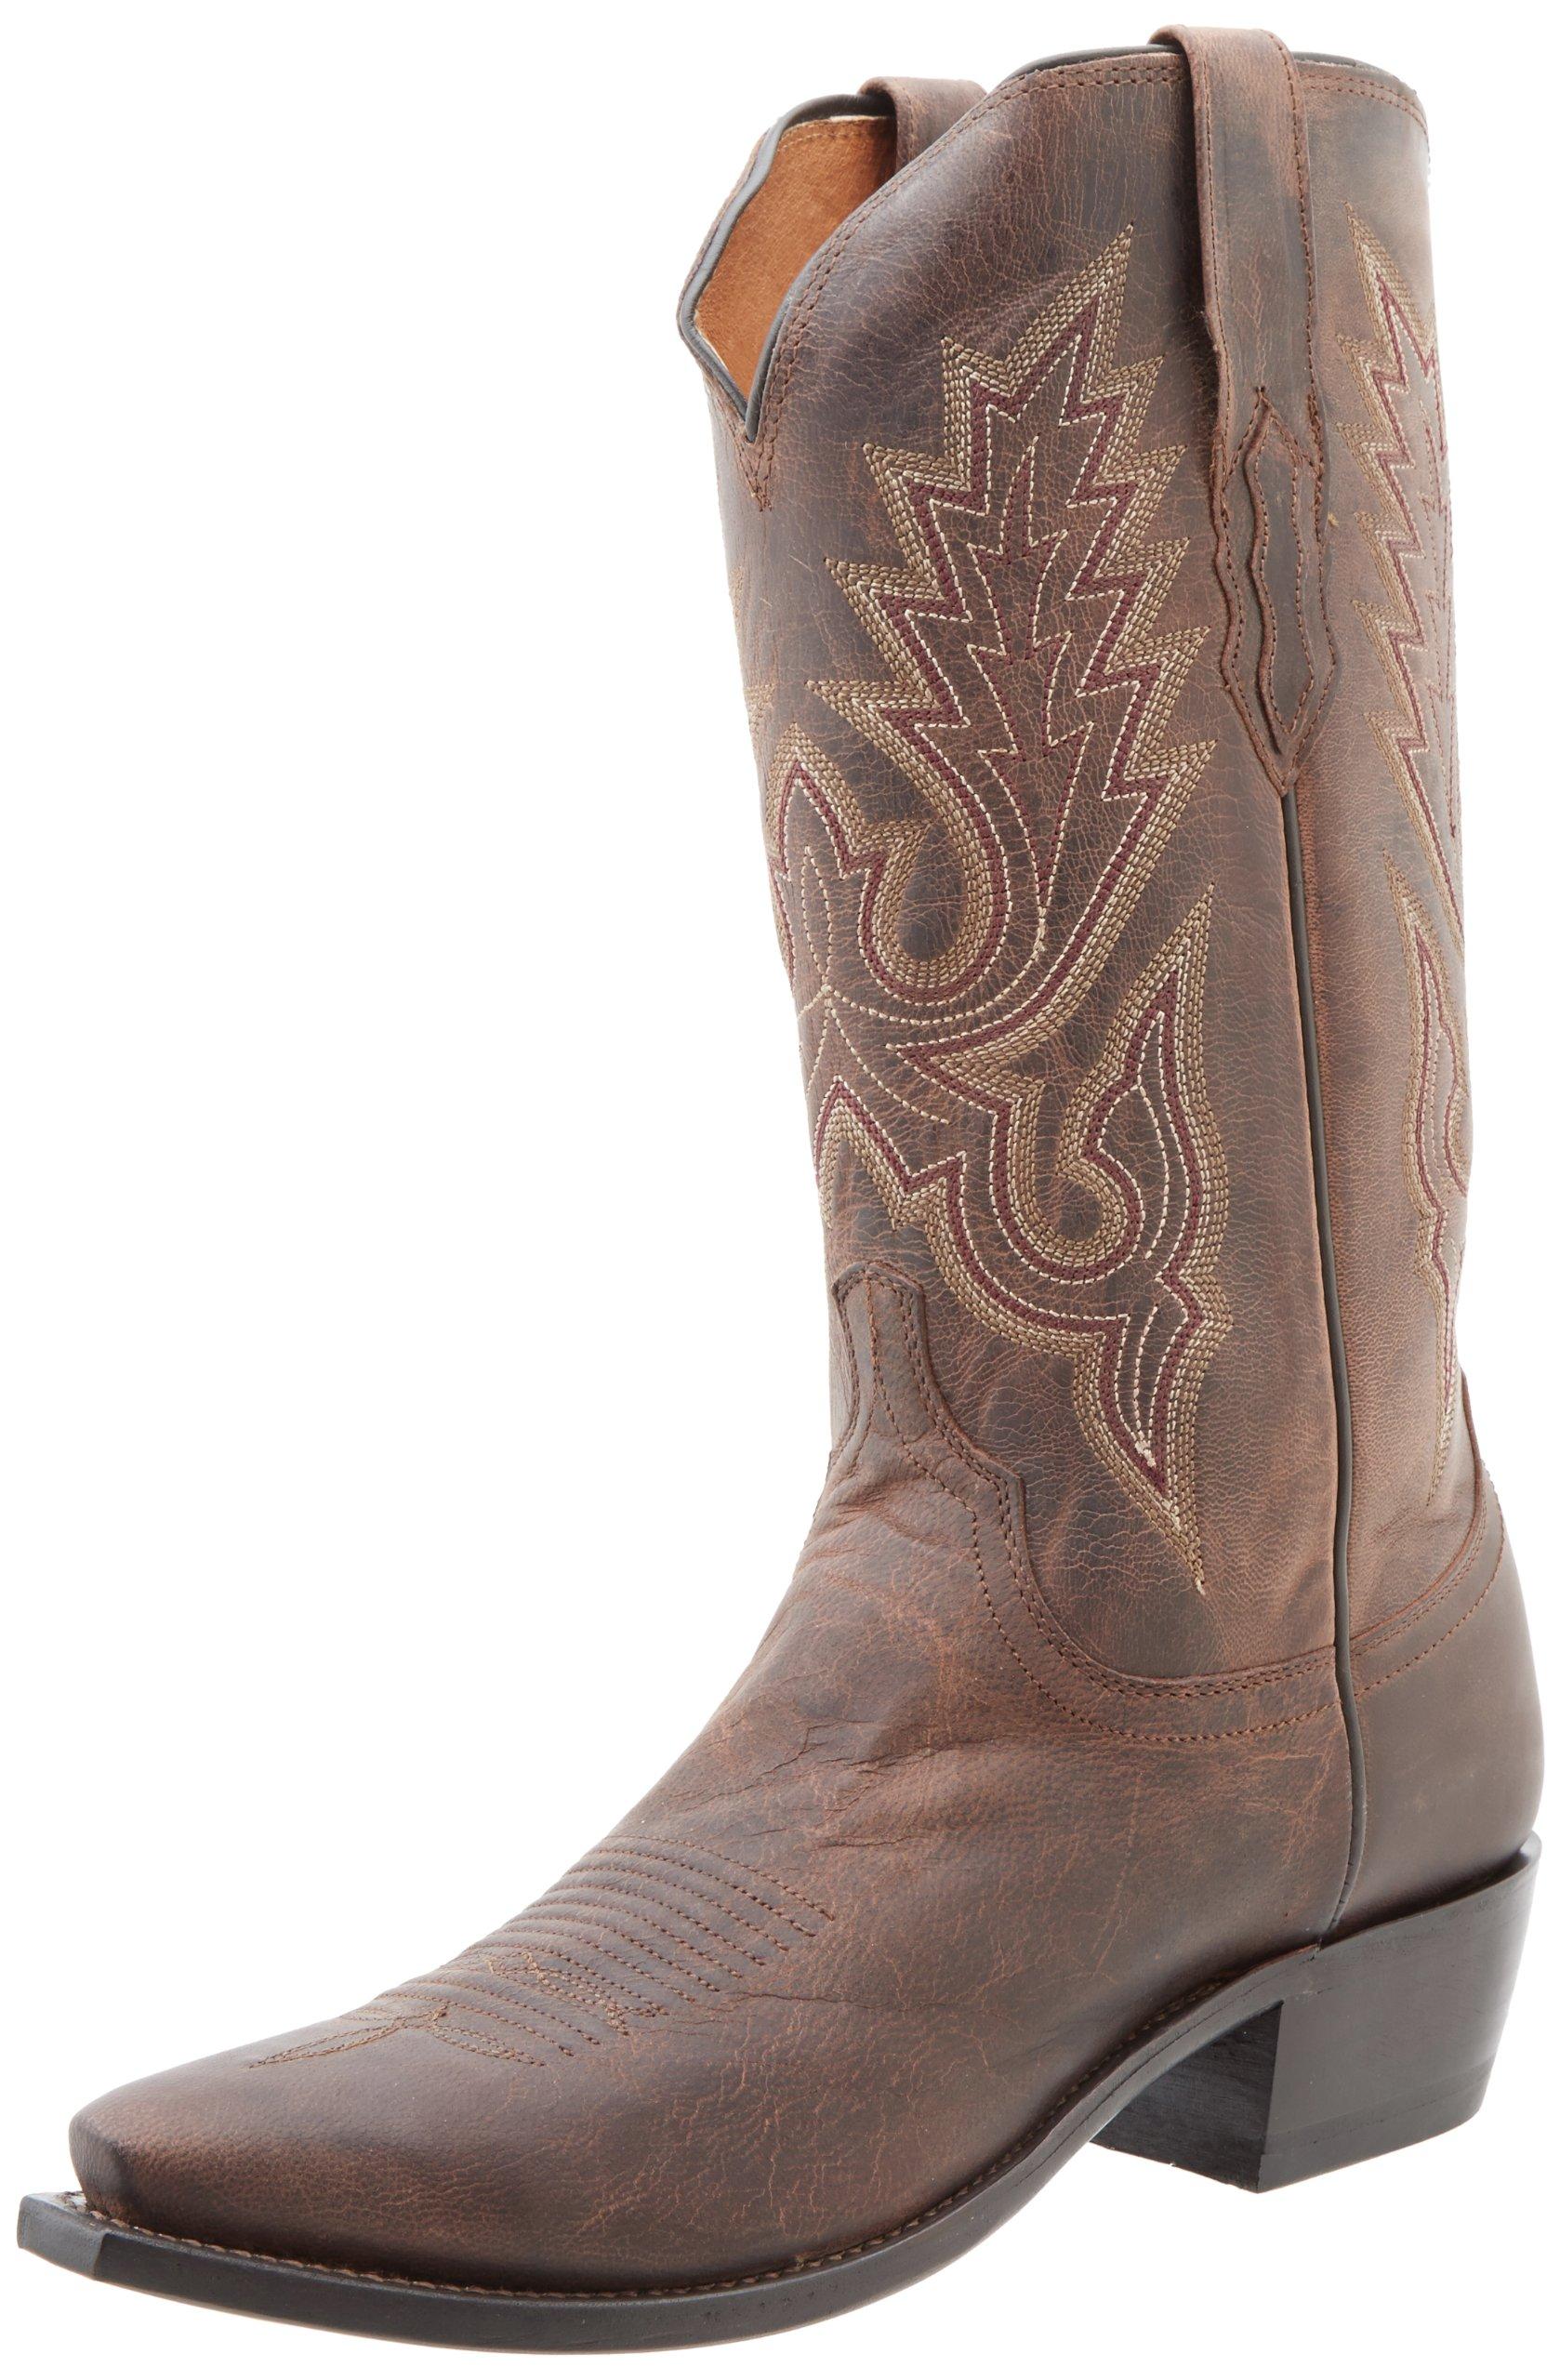 Lucchese Classics Men's M1002 Boot,Chocolate Madras Goat,13 D (M) US